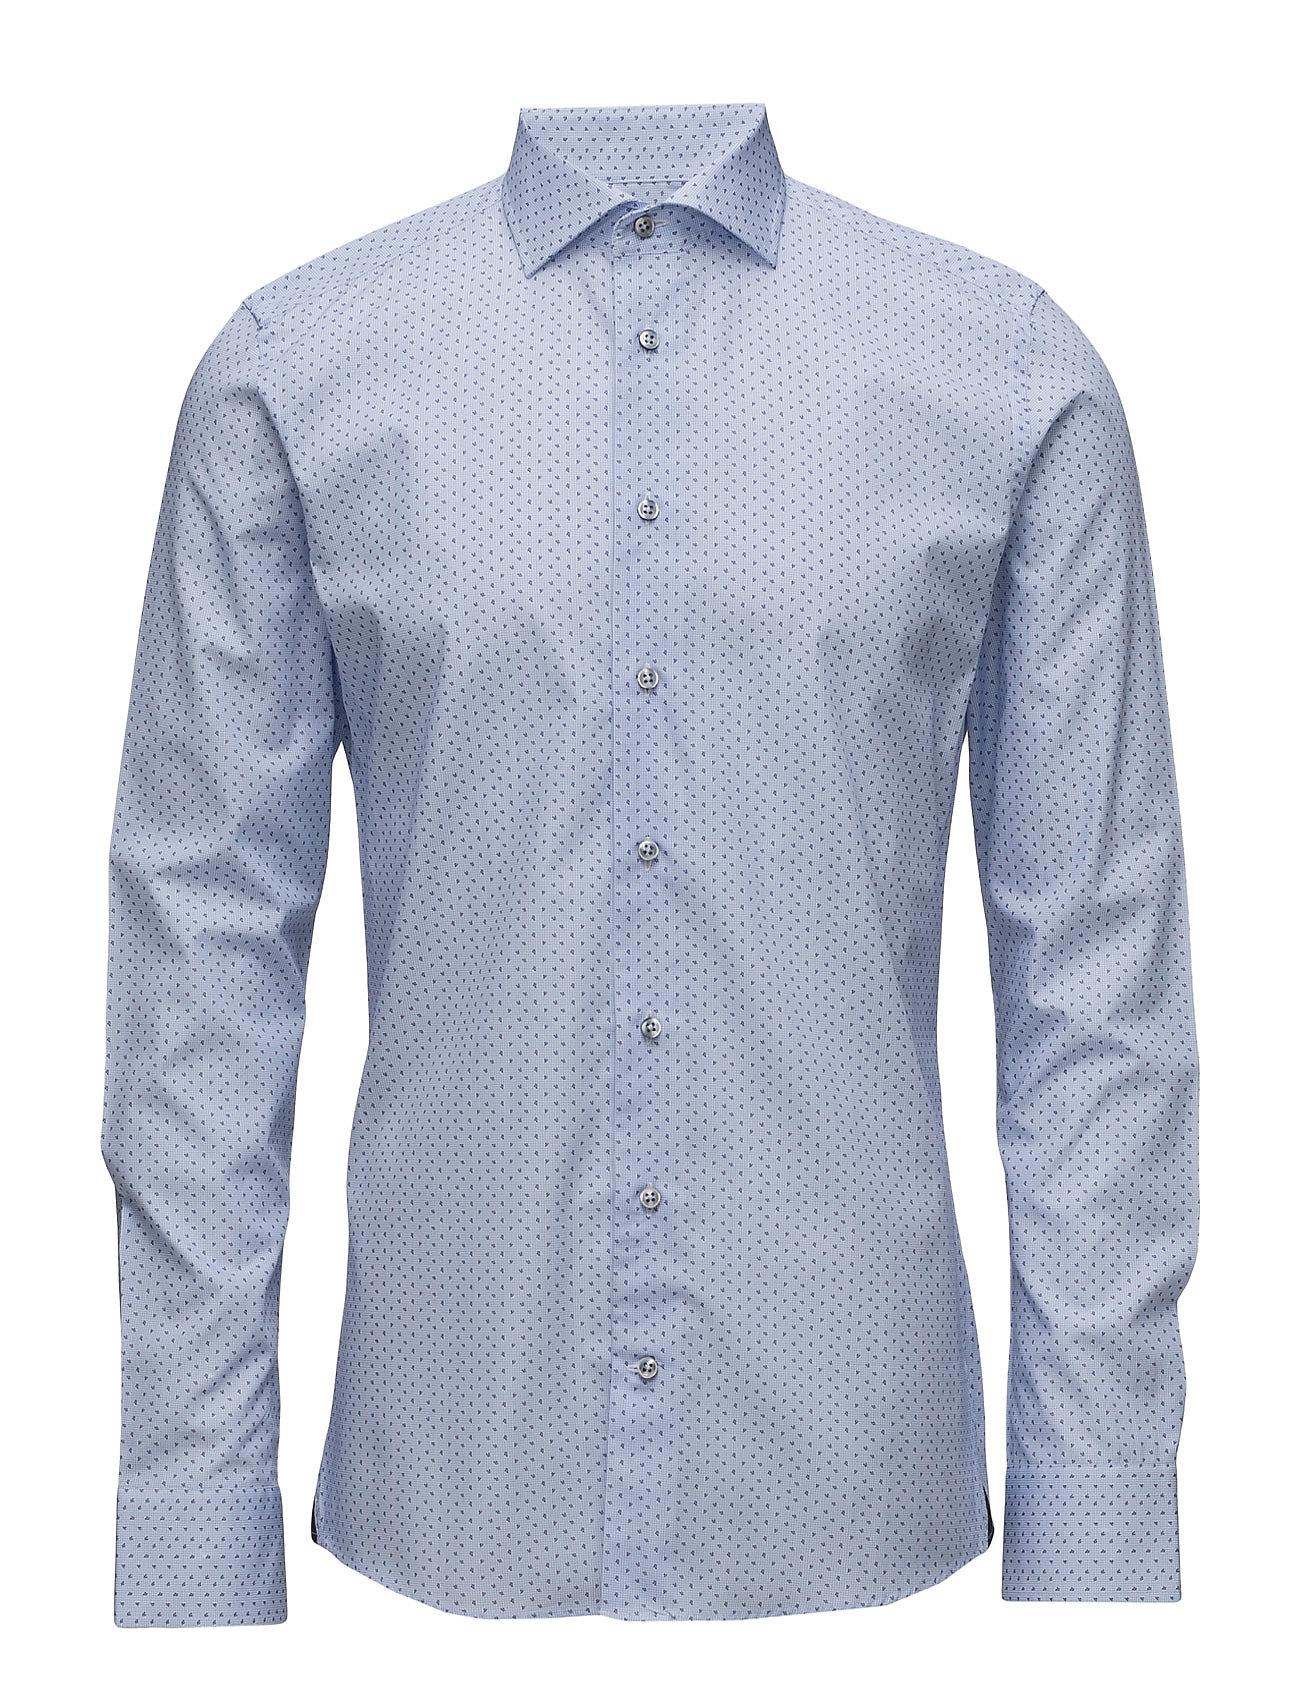 xo shirtmaker 8809 - jake fc fra boozt.com dk